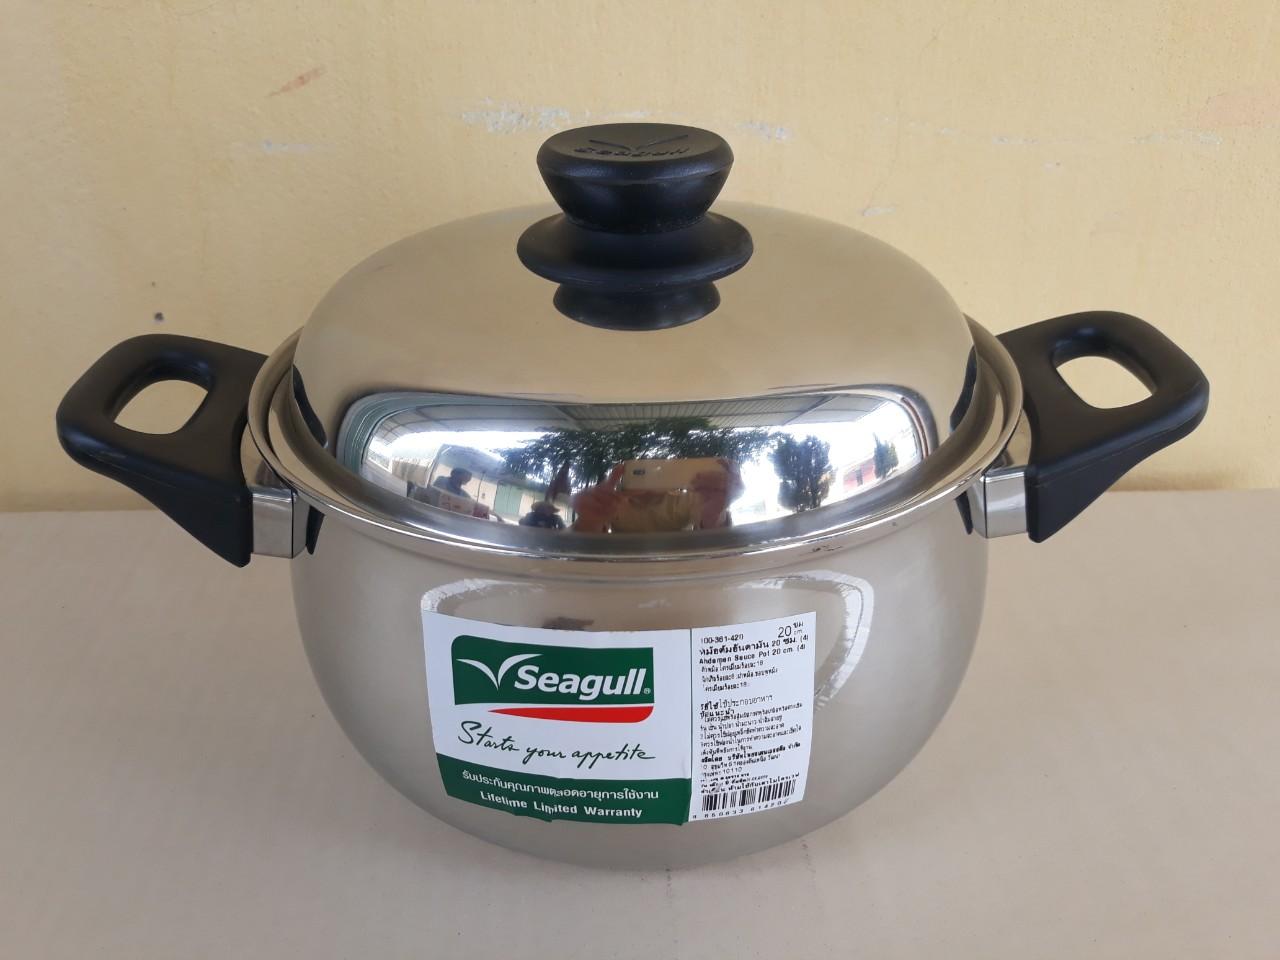 Nồi nấu canh seagull 20cm - 3.7 lít (Andaman) 100361420